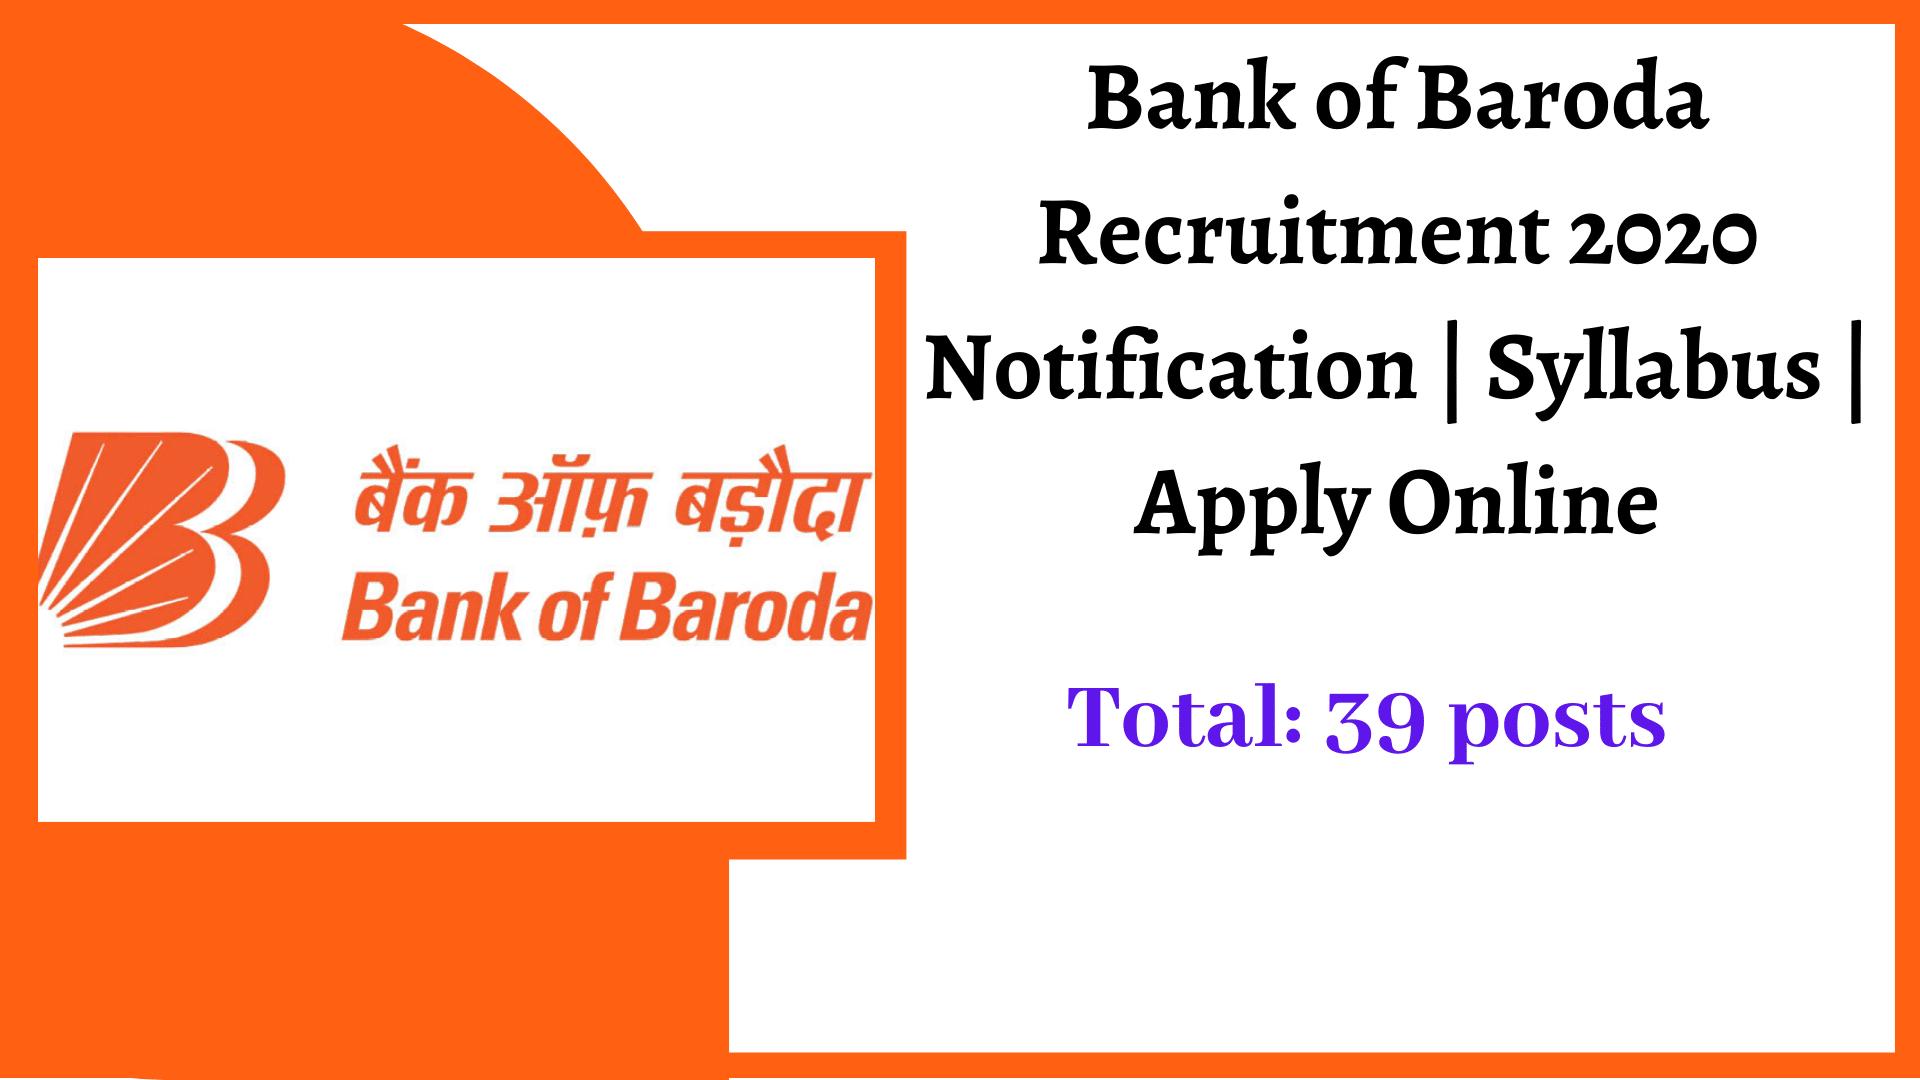 Bank of Baroda Recruitment 2020 Notification   Syllabus   Apply Online